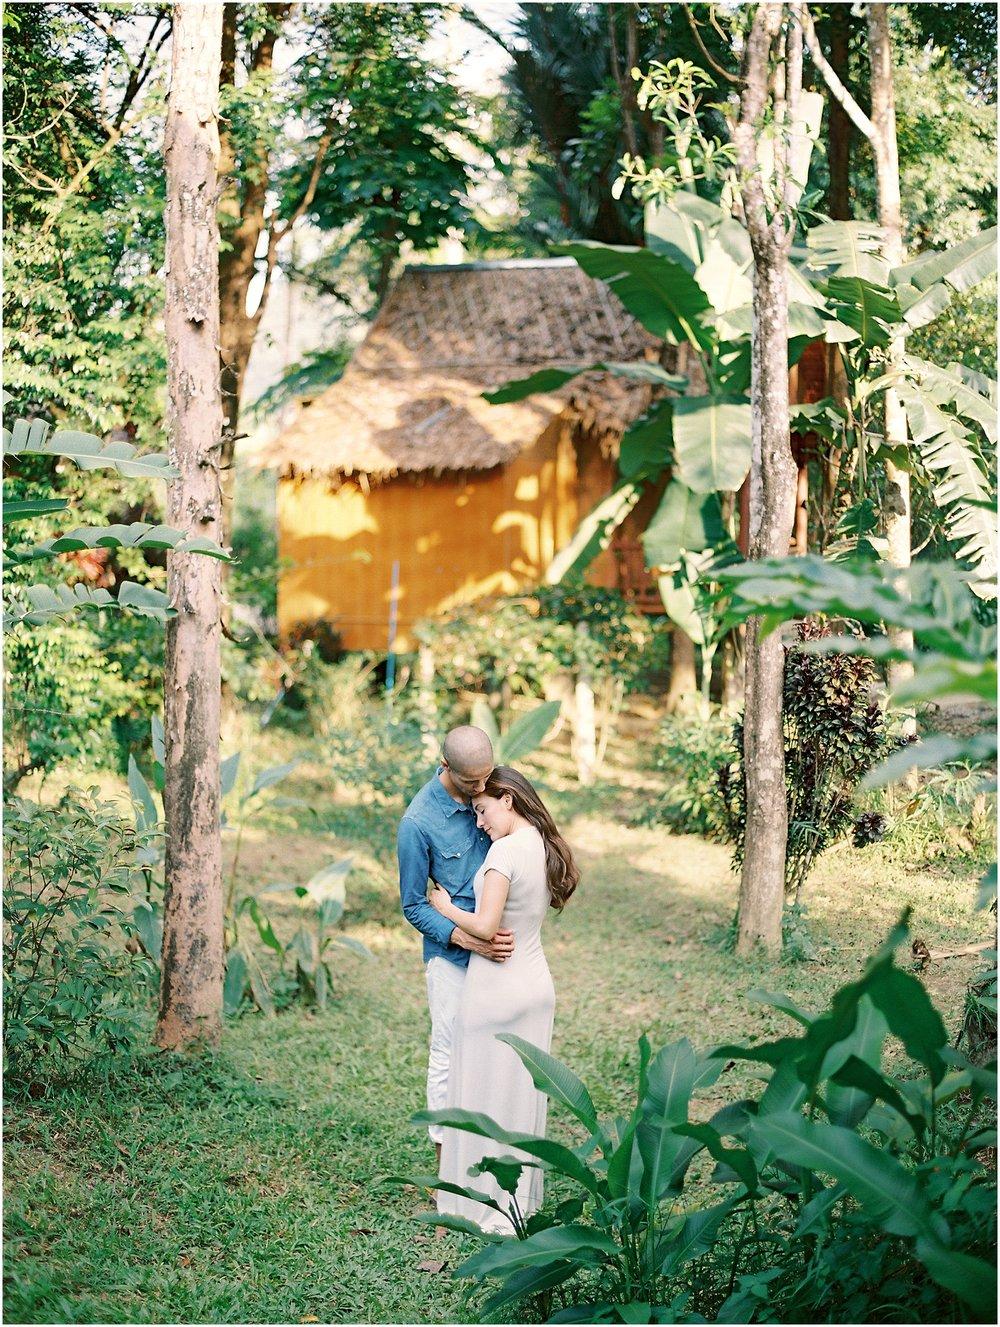 Czar & Jess Thailand Engagement_-25.jpg